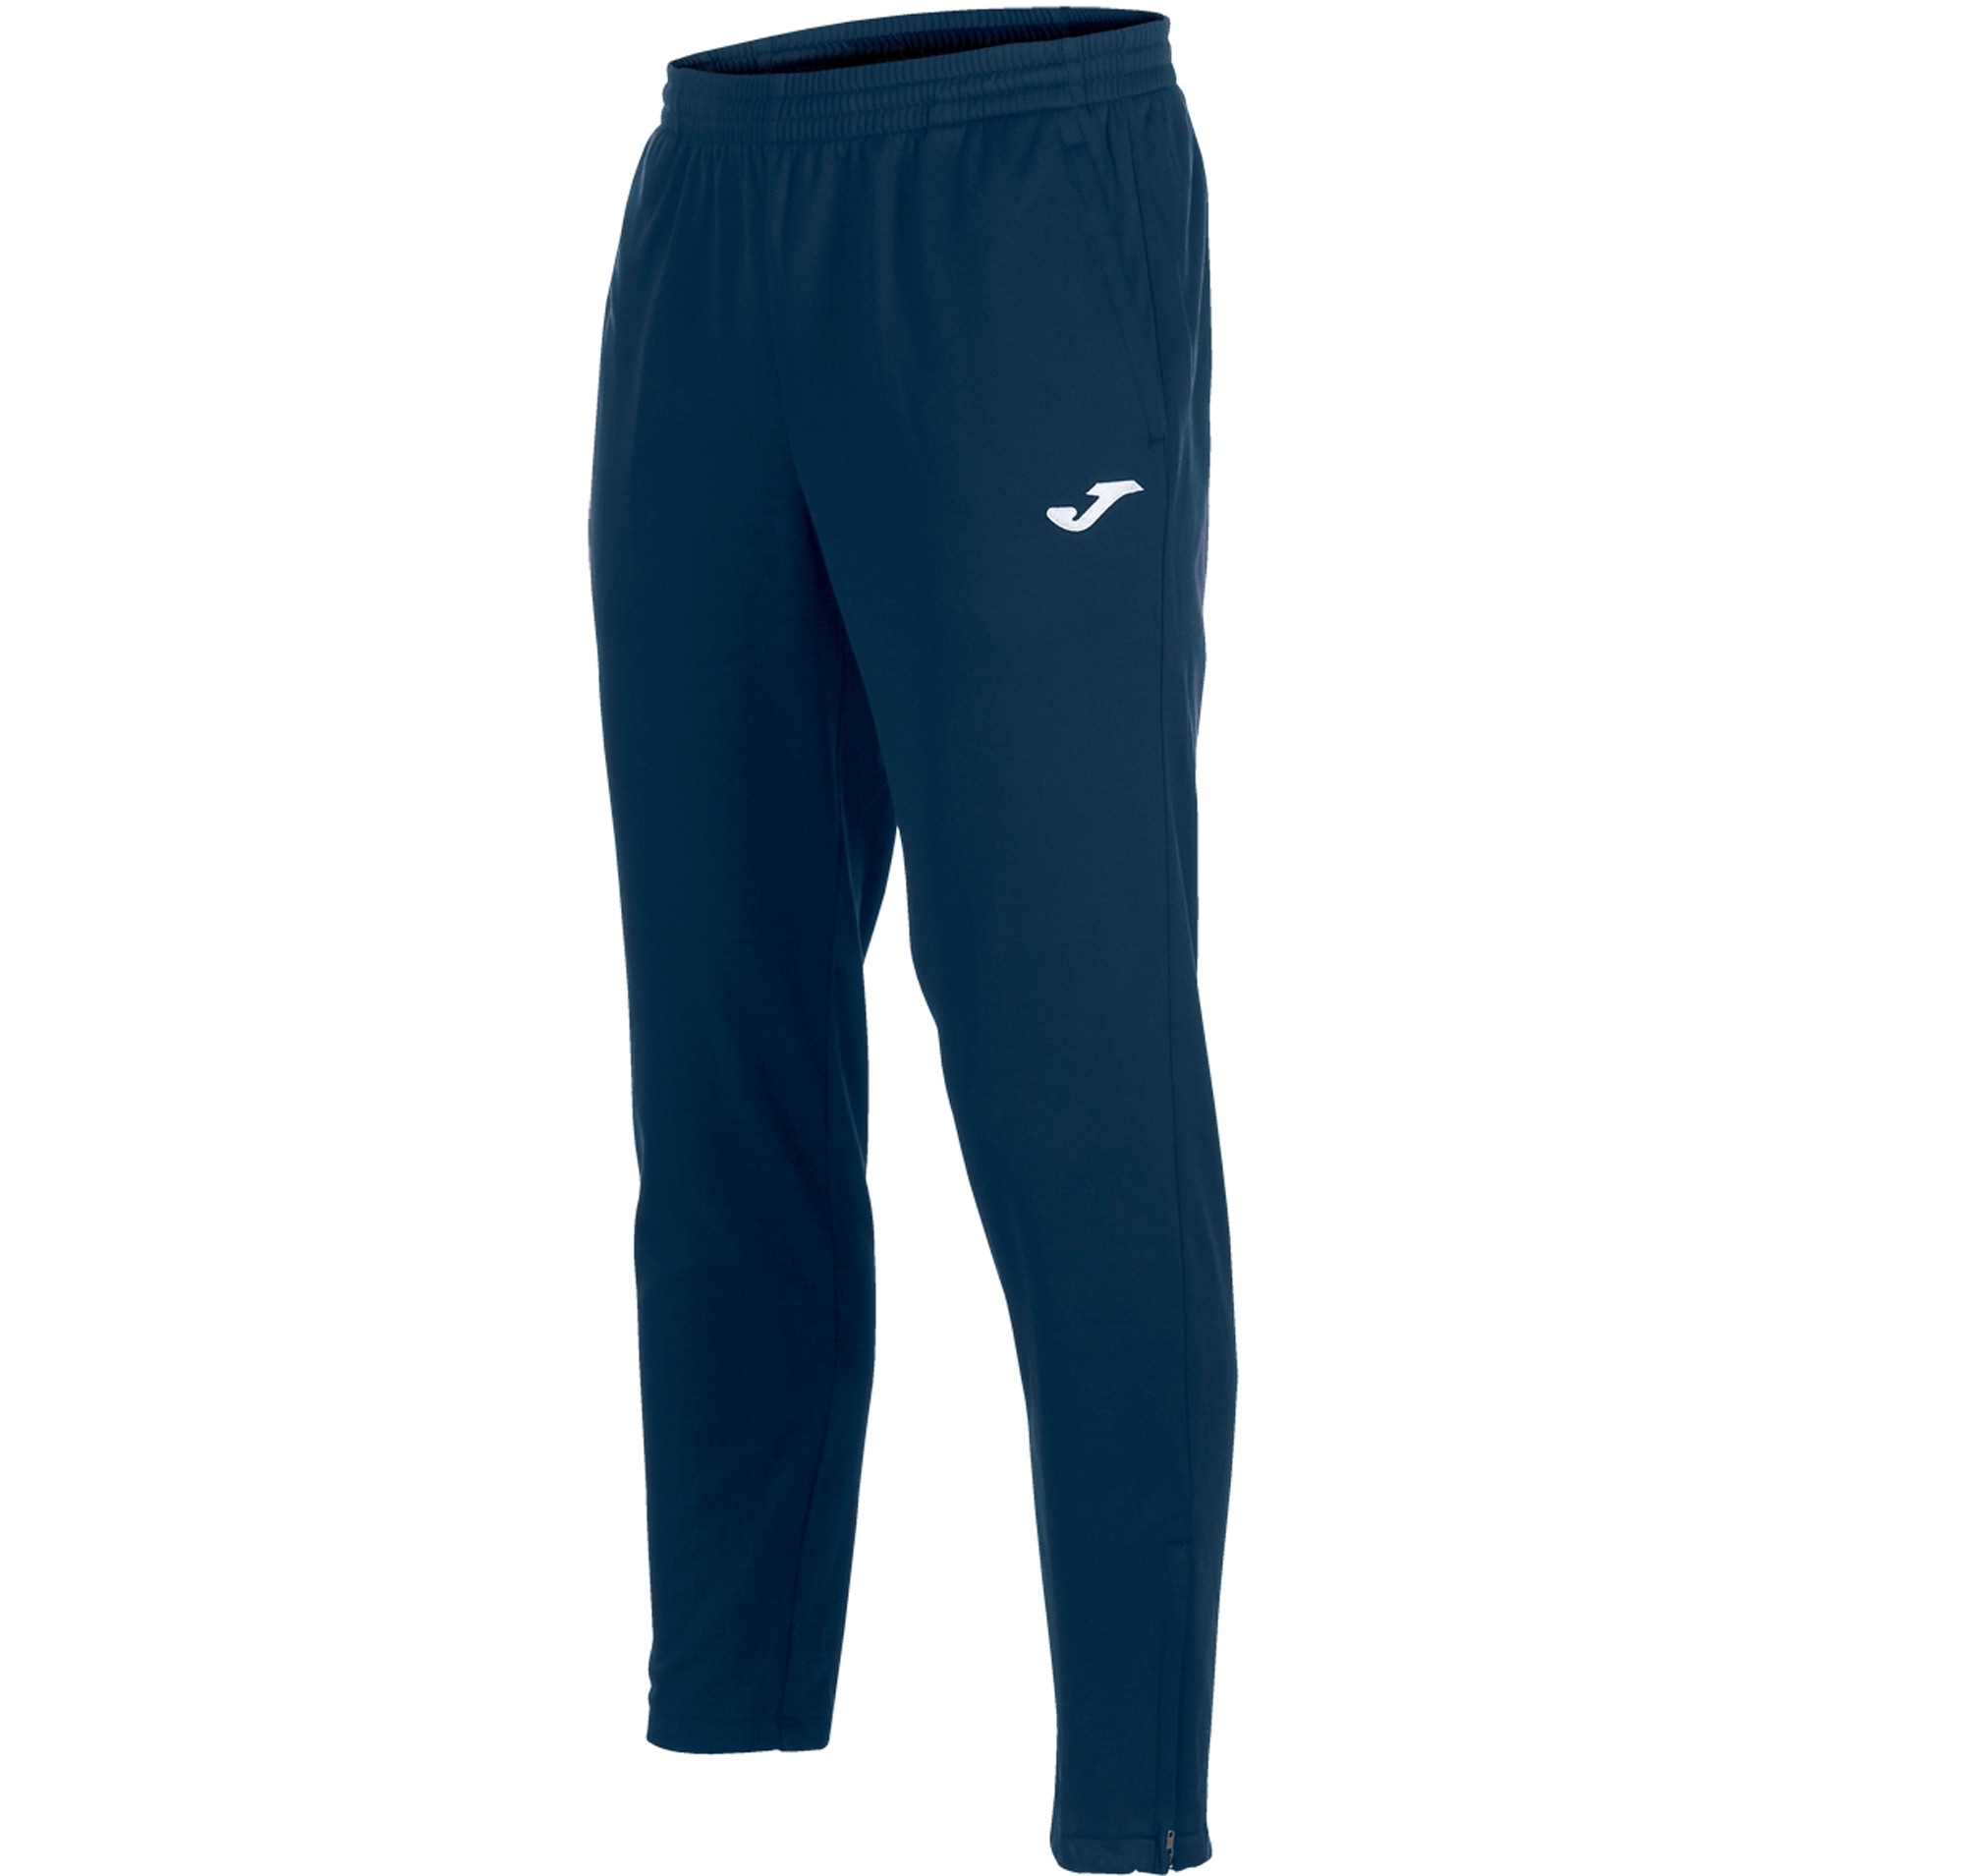 Spodnie treningowe męskie JOMA ELBA